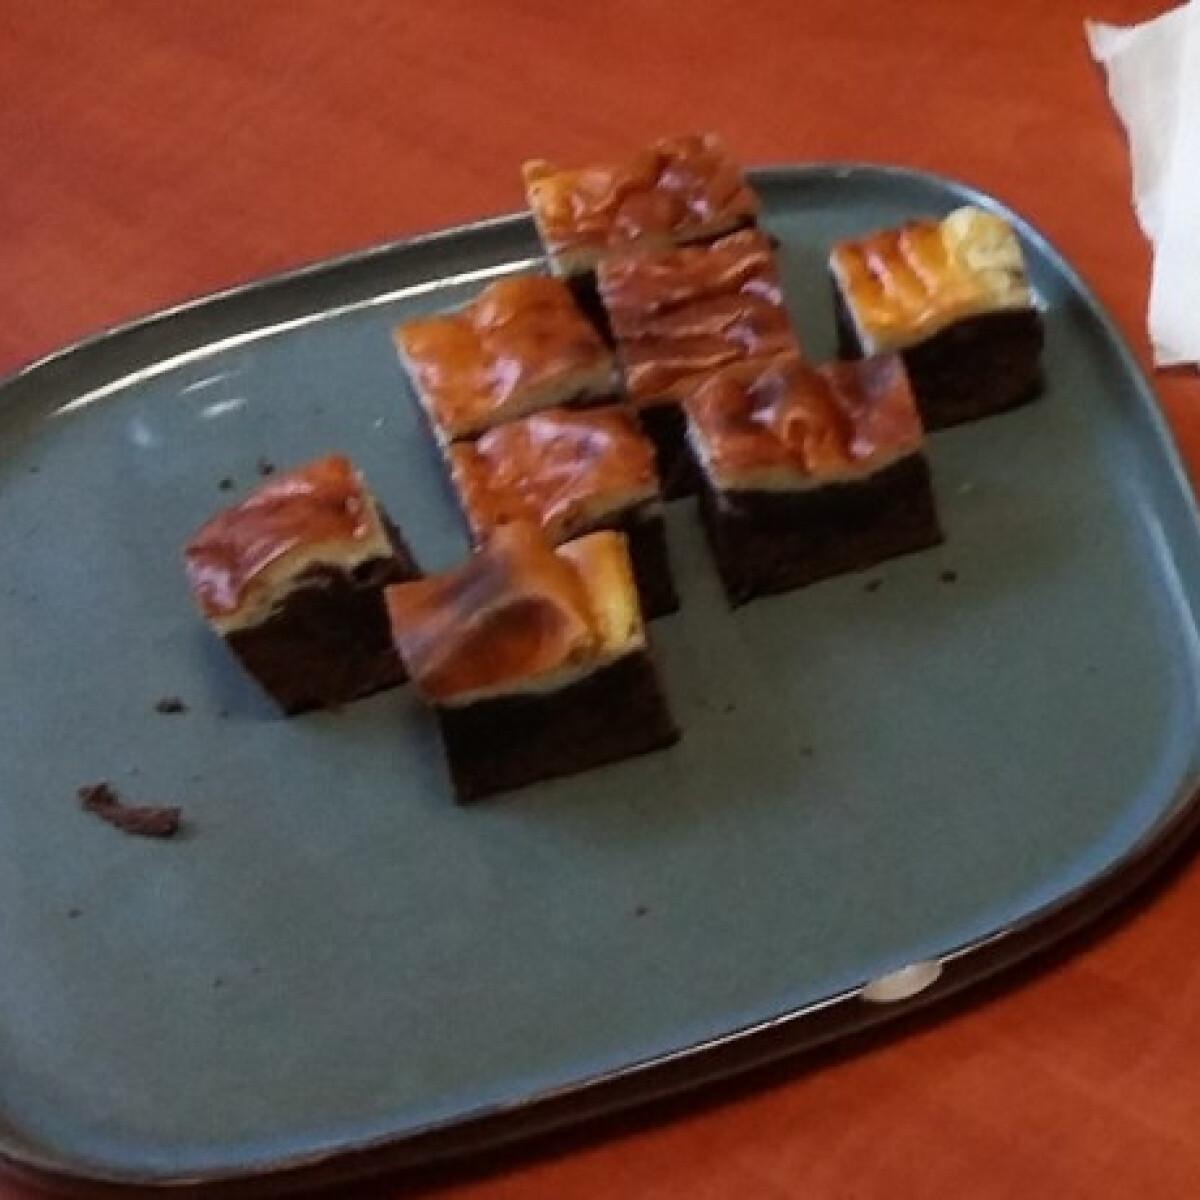 Krémsajtos brownie etoc konyhájából